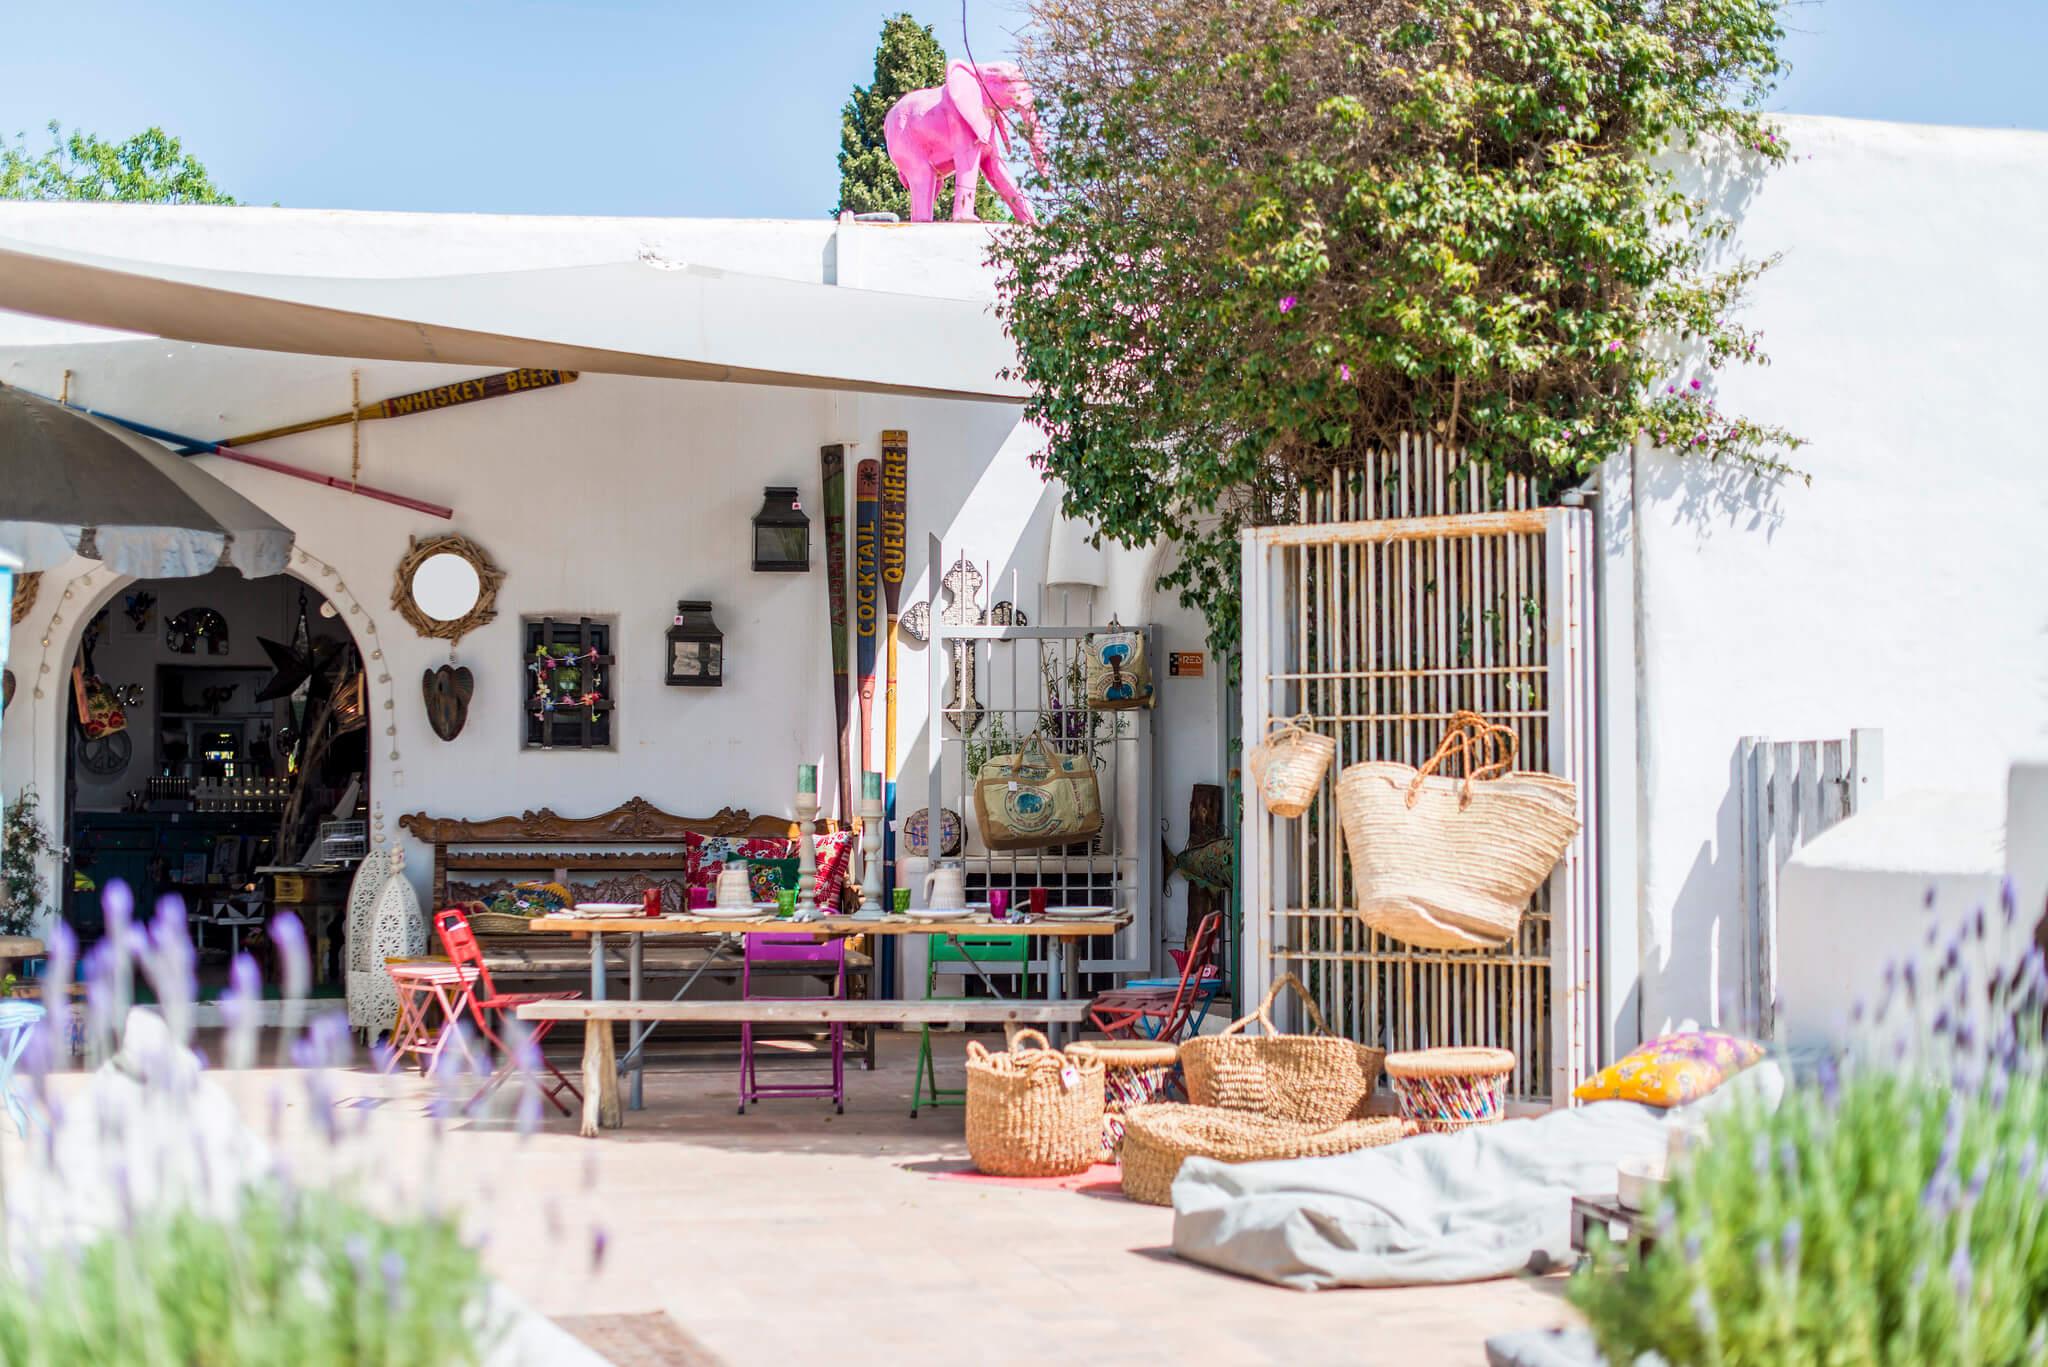 https://www.white-ibiza.com/wp-content/uploads/2020/05/white-ibiza-villas-where-to-stay-santa-gertrudis-02.jpg